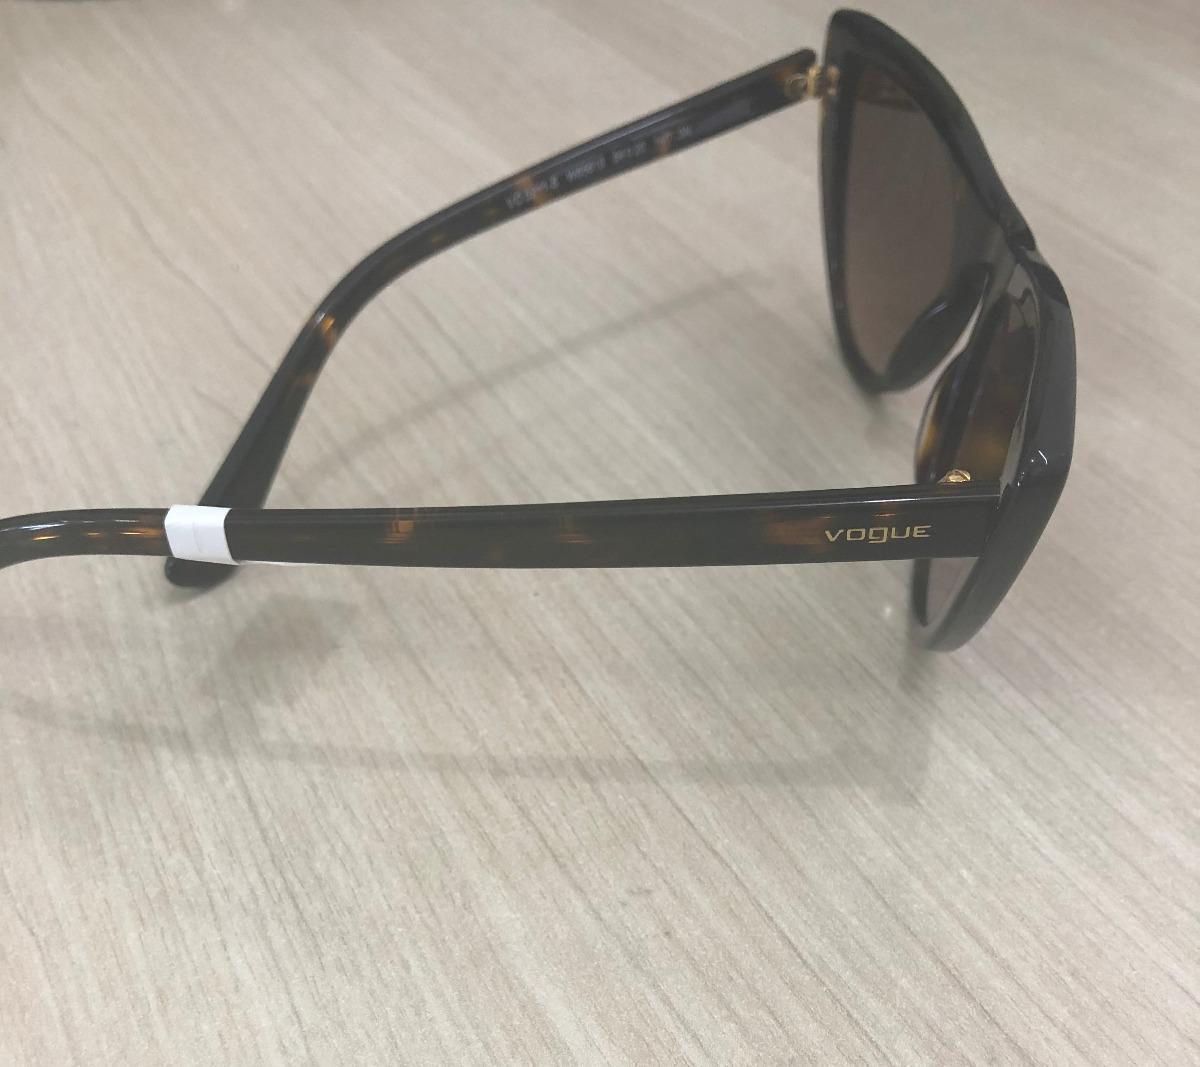 488bb91c3ca85 Oculos De Sol Vogue Gigi Hadid Original - R  419,00 em Mercado Livre